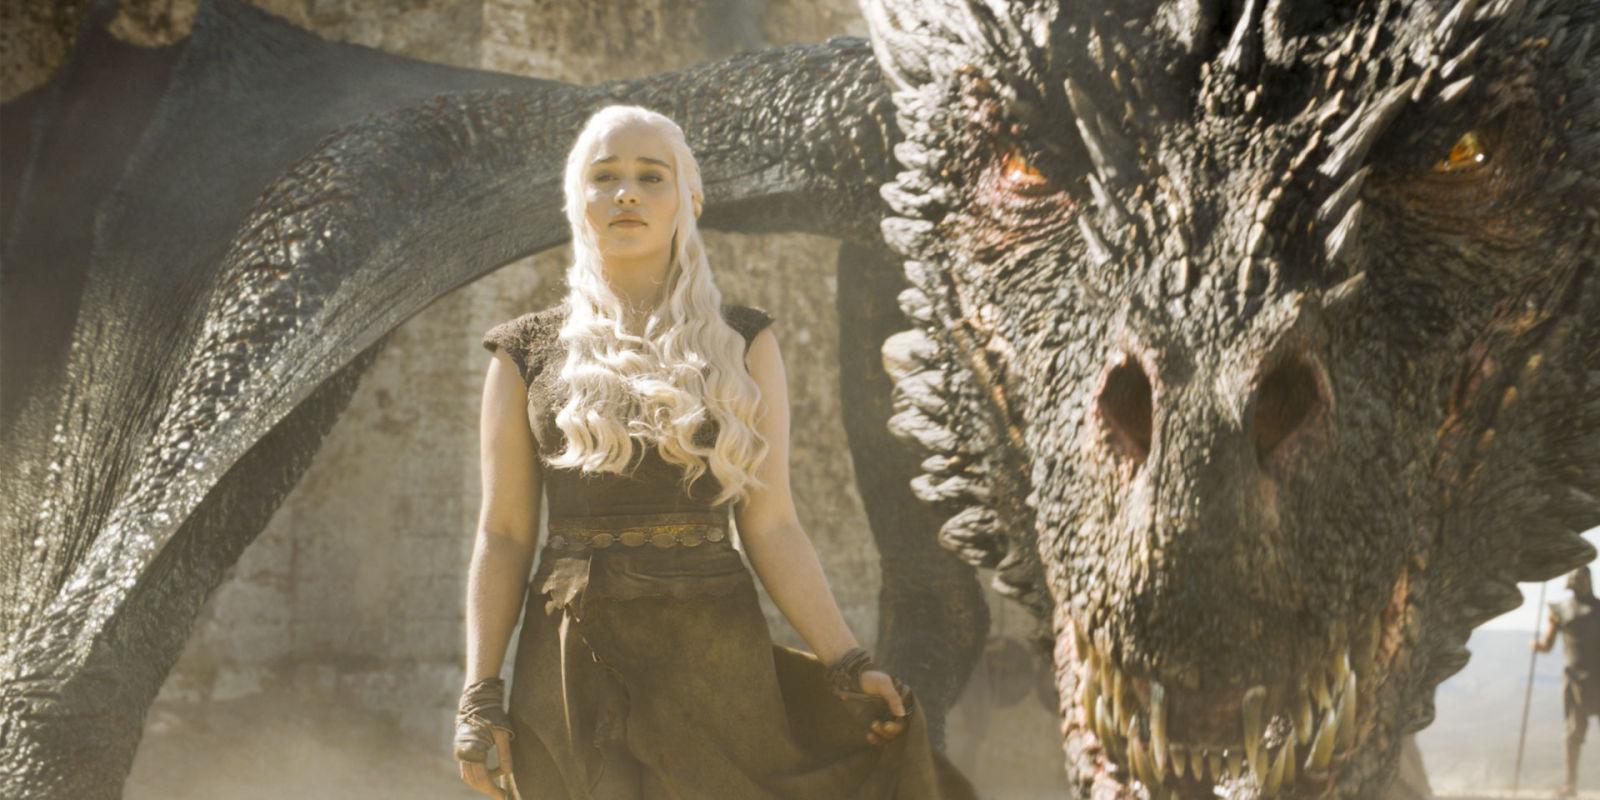 Prodigious Thrones S06e09 Imdb Thrones Is Now More Than Ever As Season Ranks As Game Thrones Is Now More Than Ever As Season Ranks As Game Game Thrones S06e09 Reddit Game houzz-02 Game Of Thrones S06e09